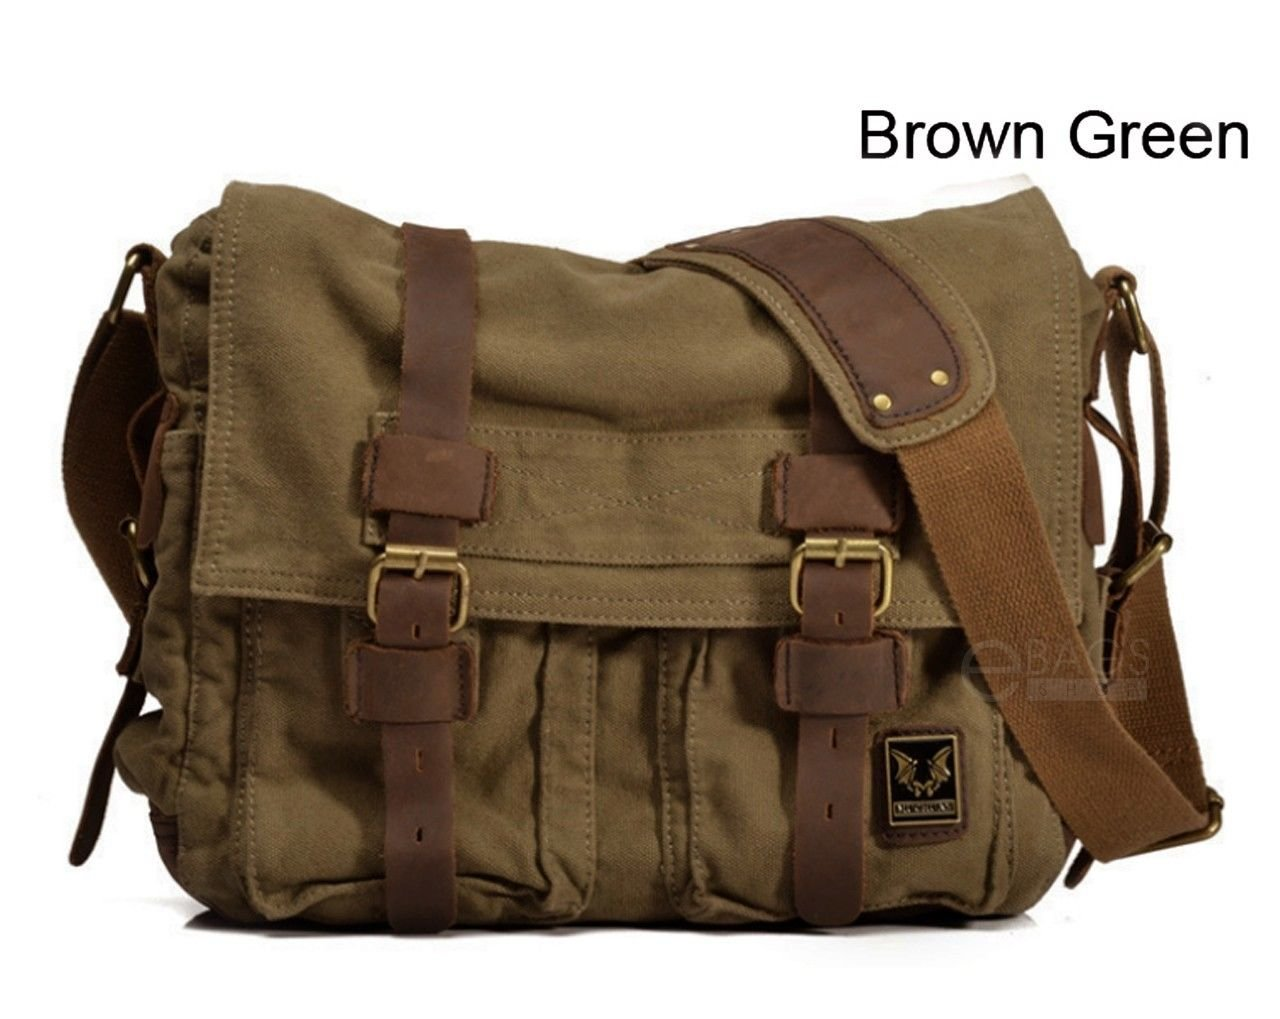 Travelogy Luggage Brown Green Mens Military Canvas Leather Satchel School 14 Laptop Shoulder Messenger Bag